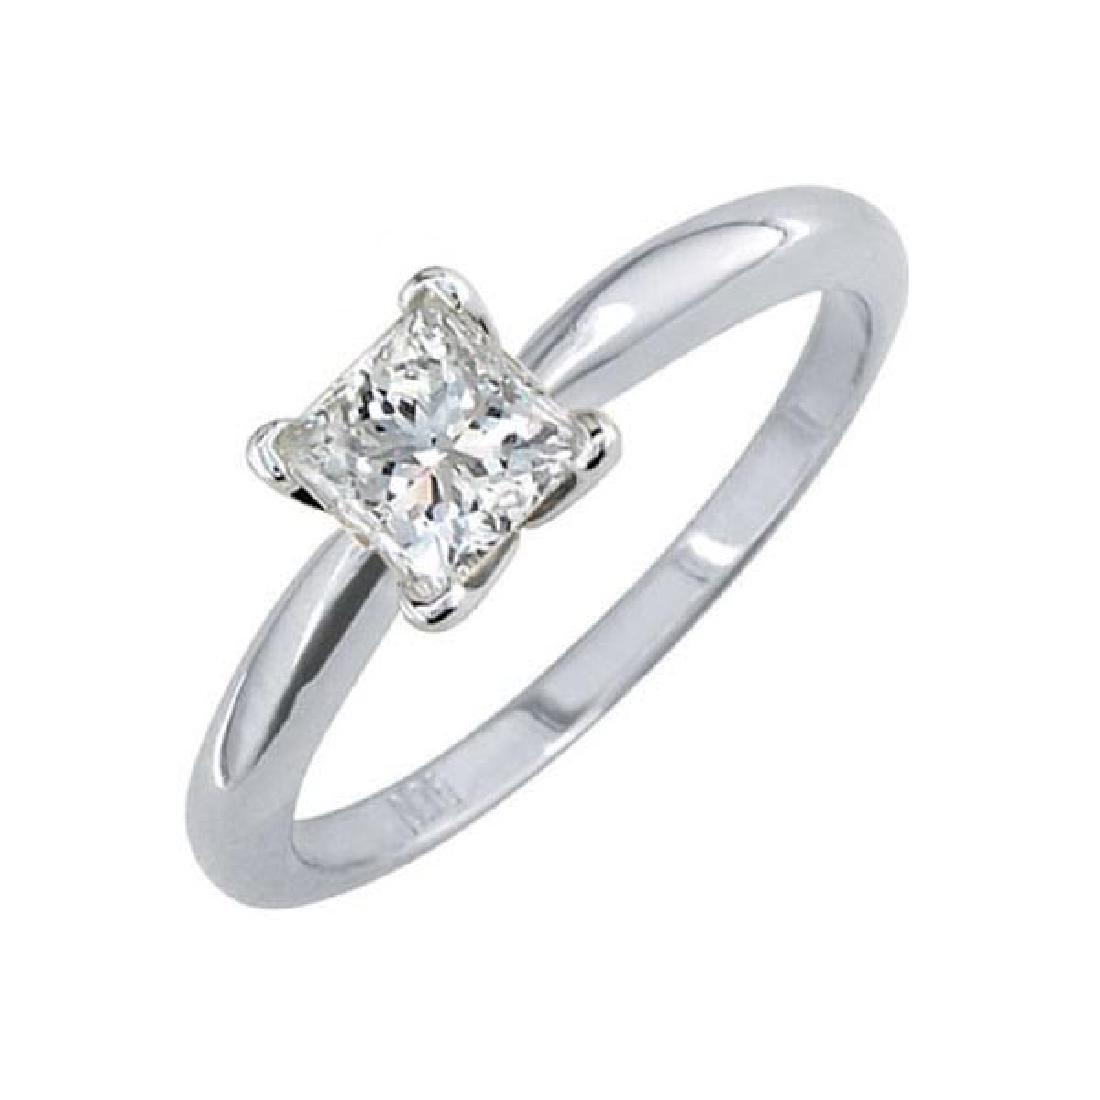 Certified 0.79 CTW Princess Diamond Solitaire 14k Ring